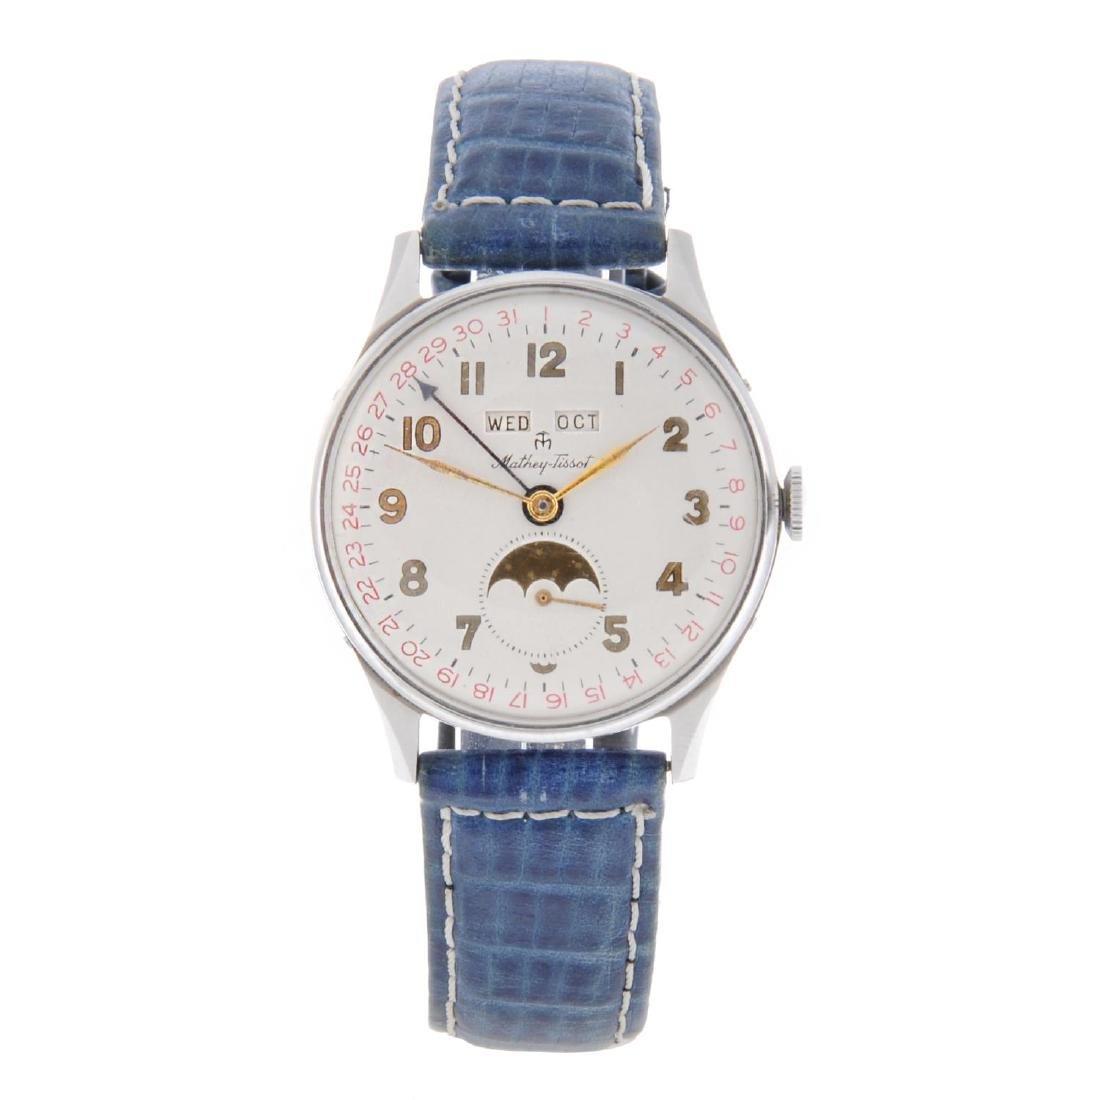 MATHEY-TISSOT - a gentleman's Triple Date wrist watch.